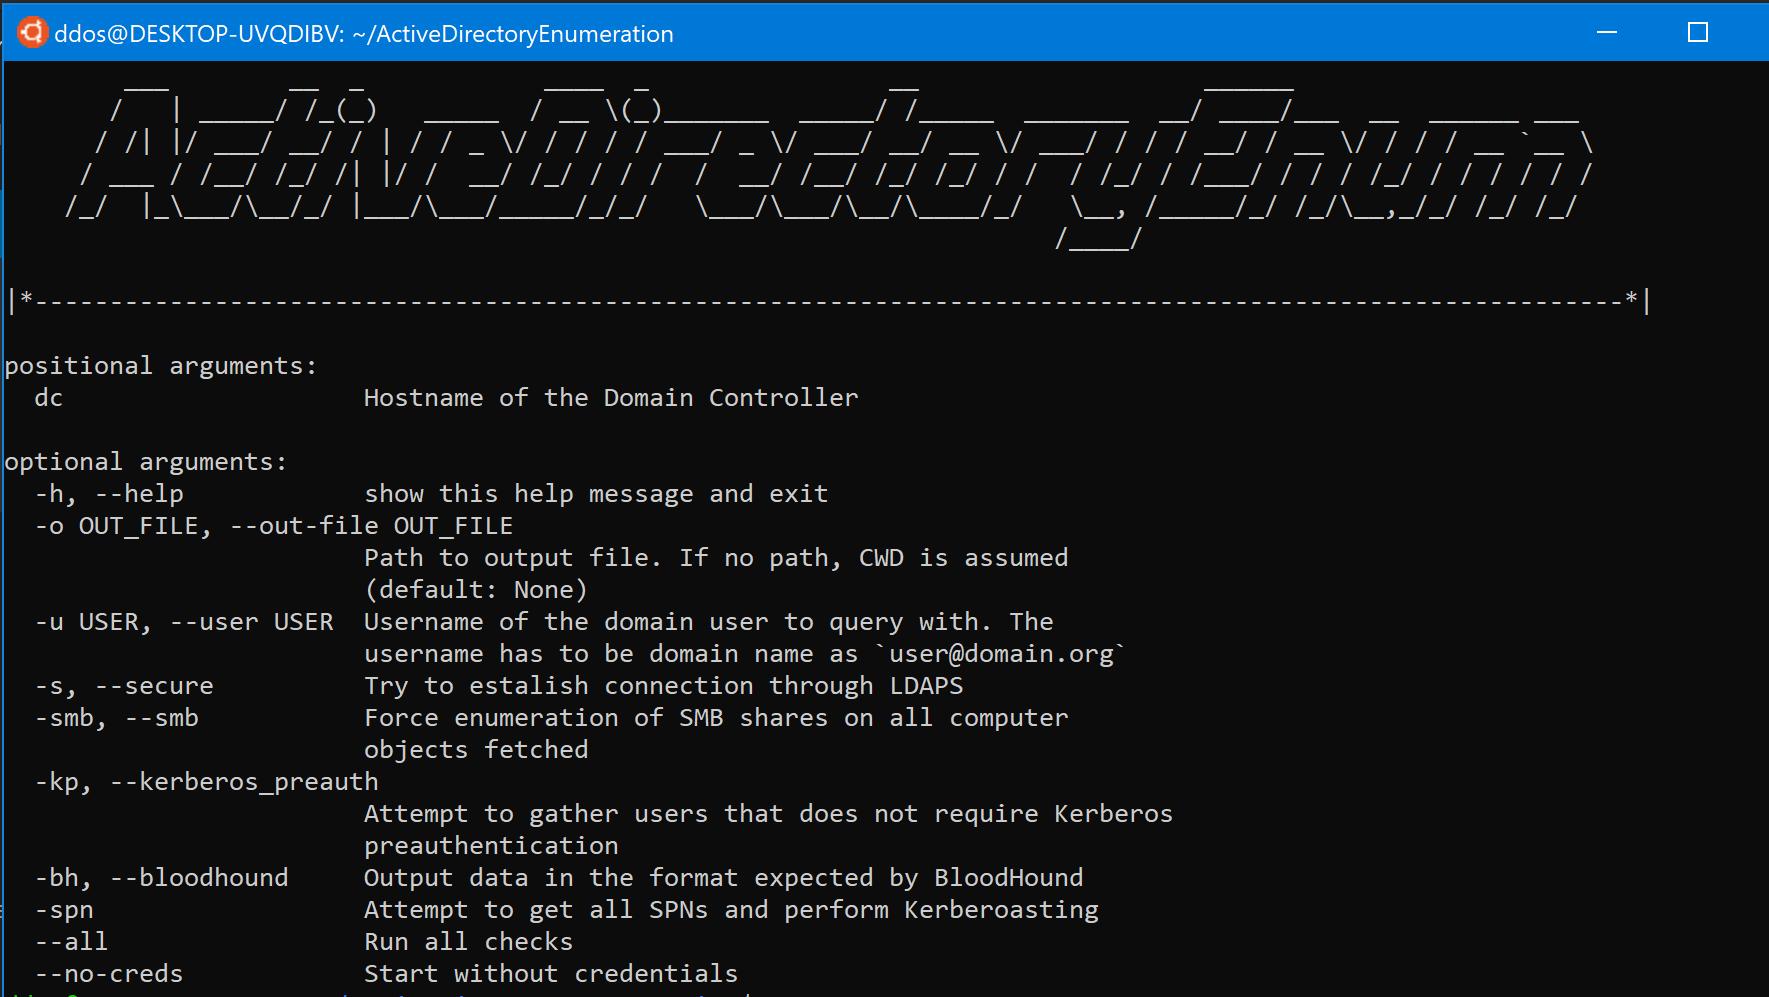 ActiveDirectoryEnumeration: Enumerate AD through LDAP